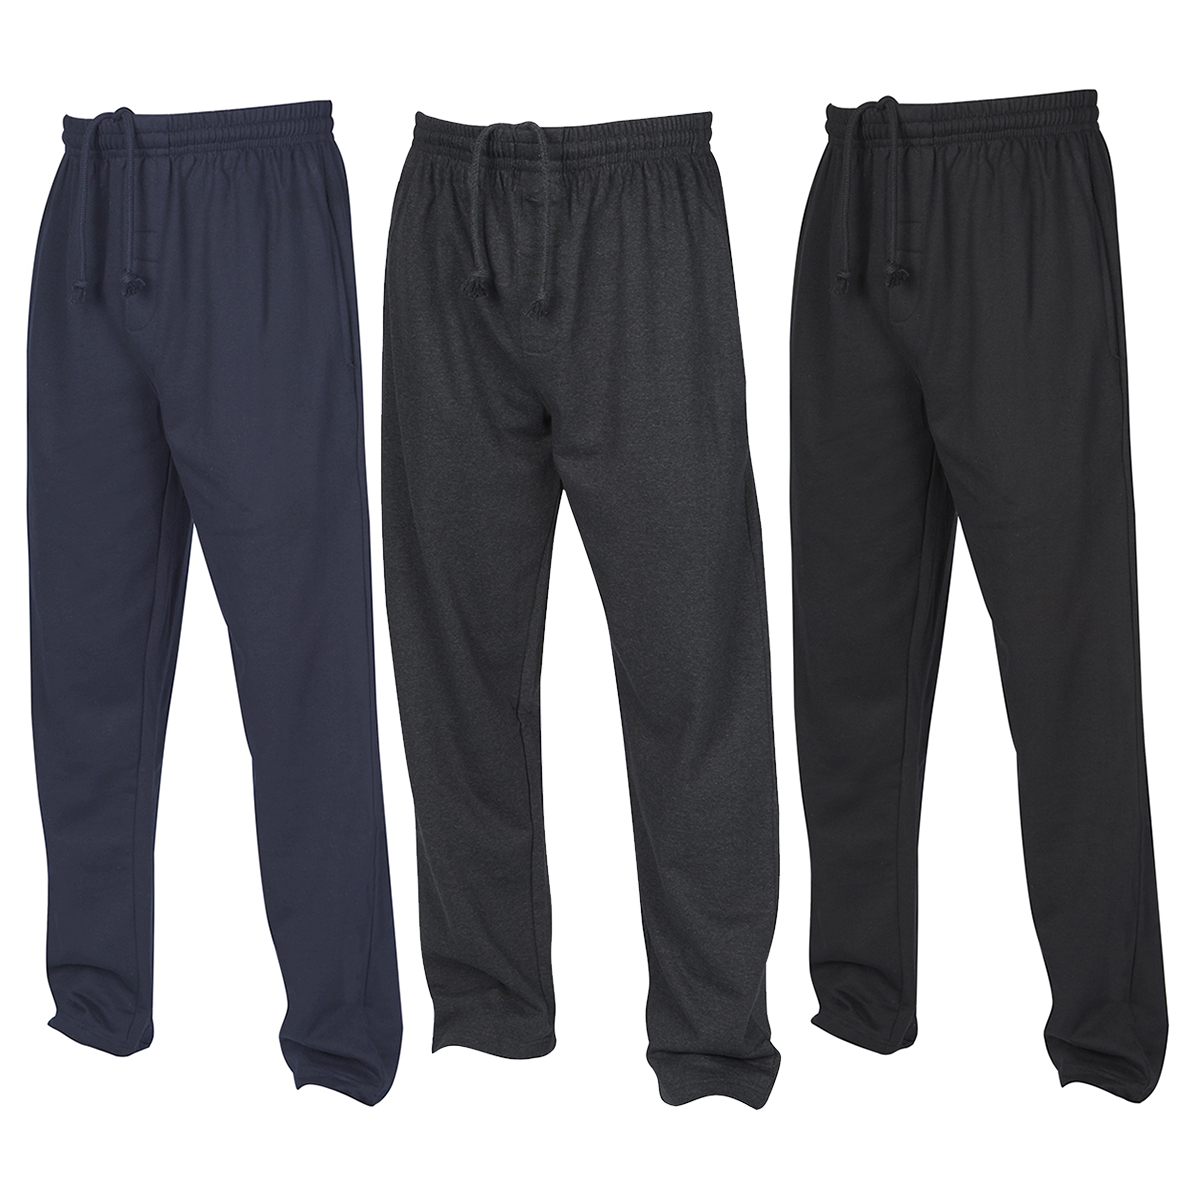 Mens Joggers Jogging Sweat Pants Tracksuit Bottoms Elasticated Waist NEW UK 1436692f5d3